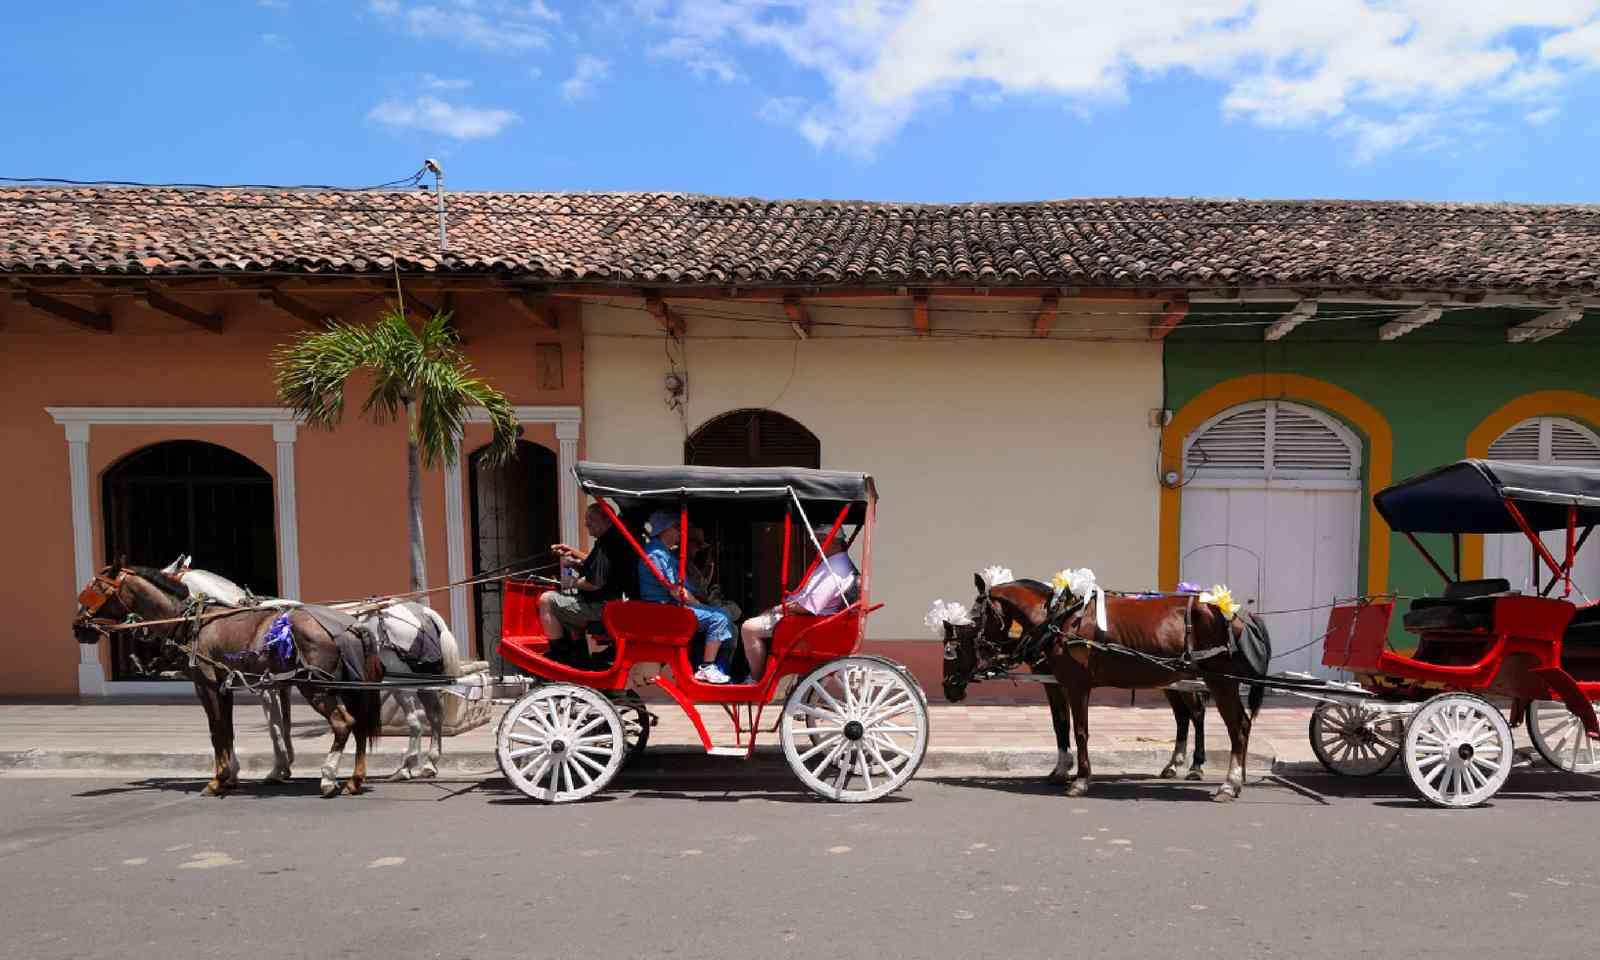 Horse carts in Granada, Nicaragua (Shutterstock)